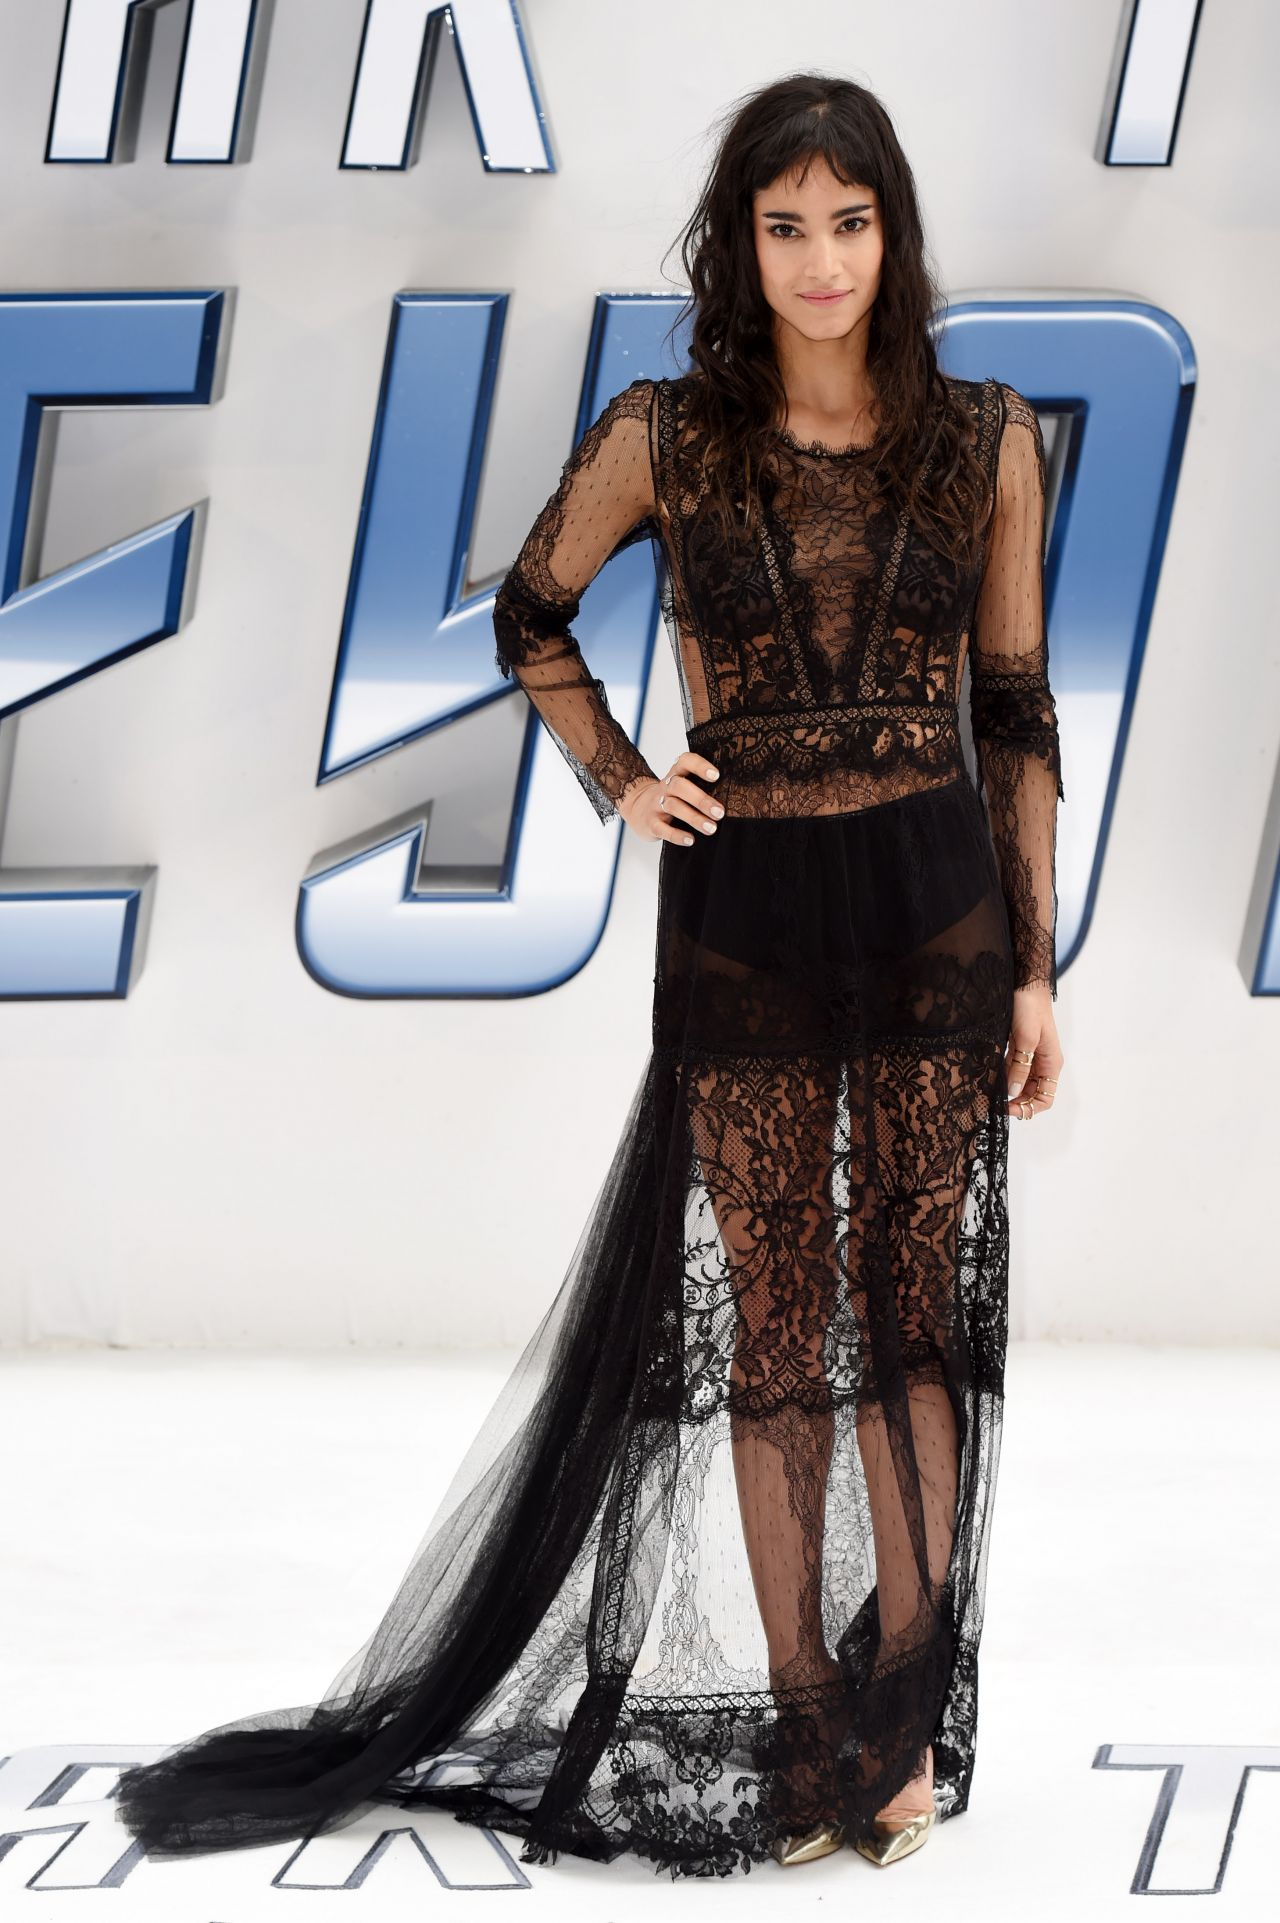 Sofia Boutella - Star Trek: Beyond Premiere in London